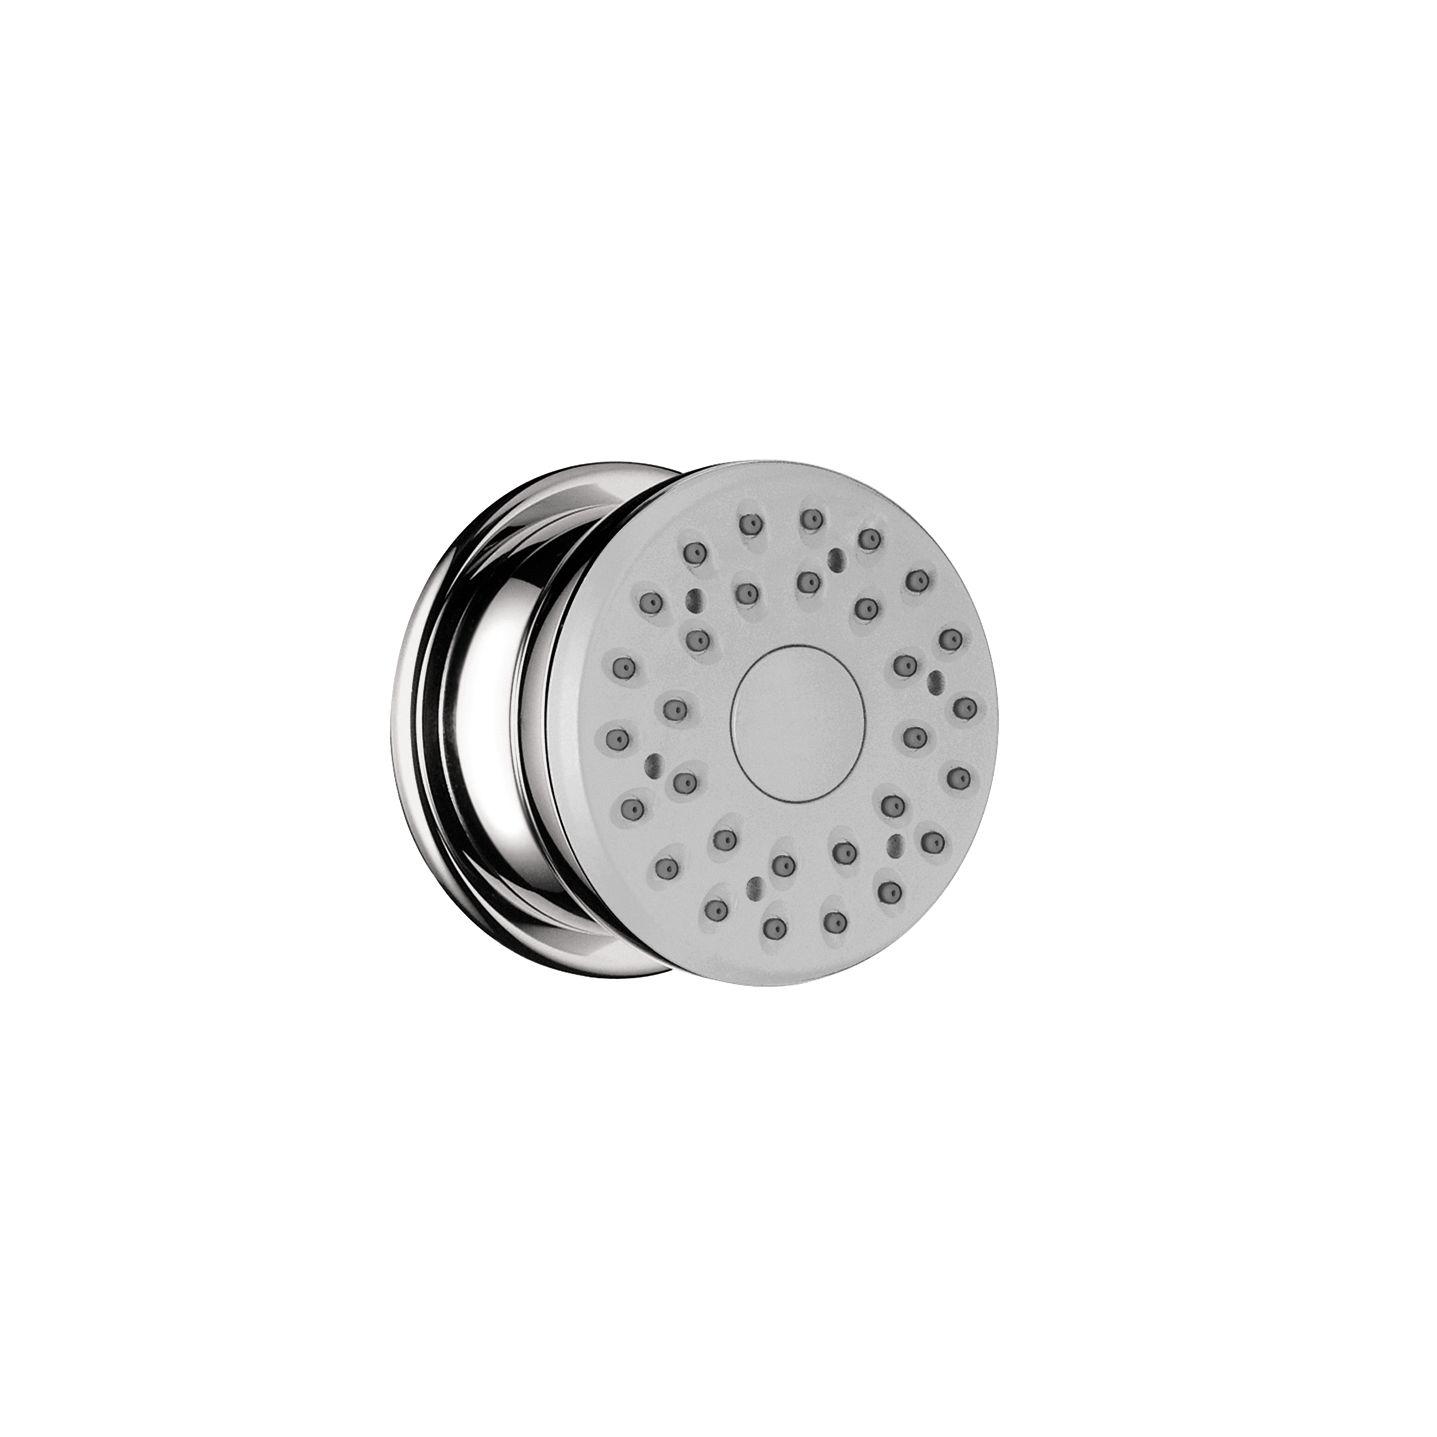 Hansgrohe 28467821 Brushed Nickel ShowerPower Body Spray Adjustable ...